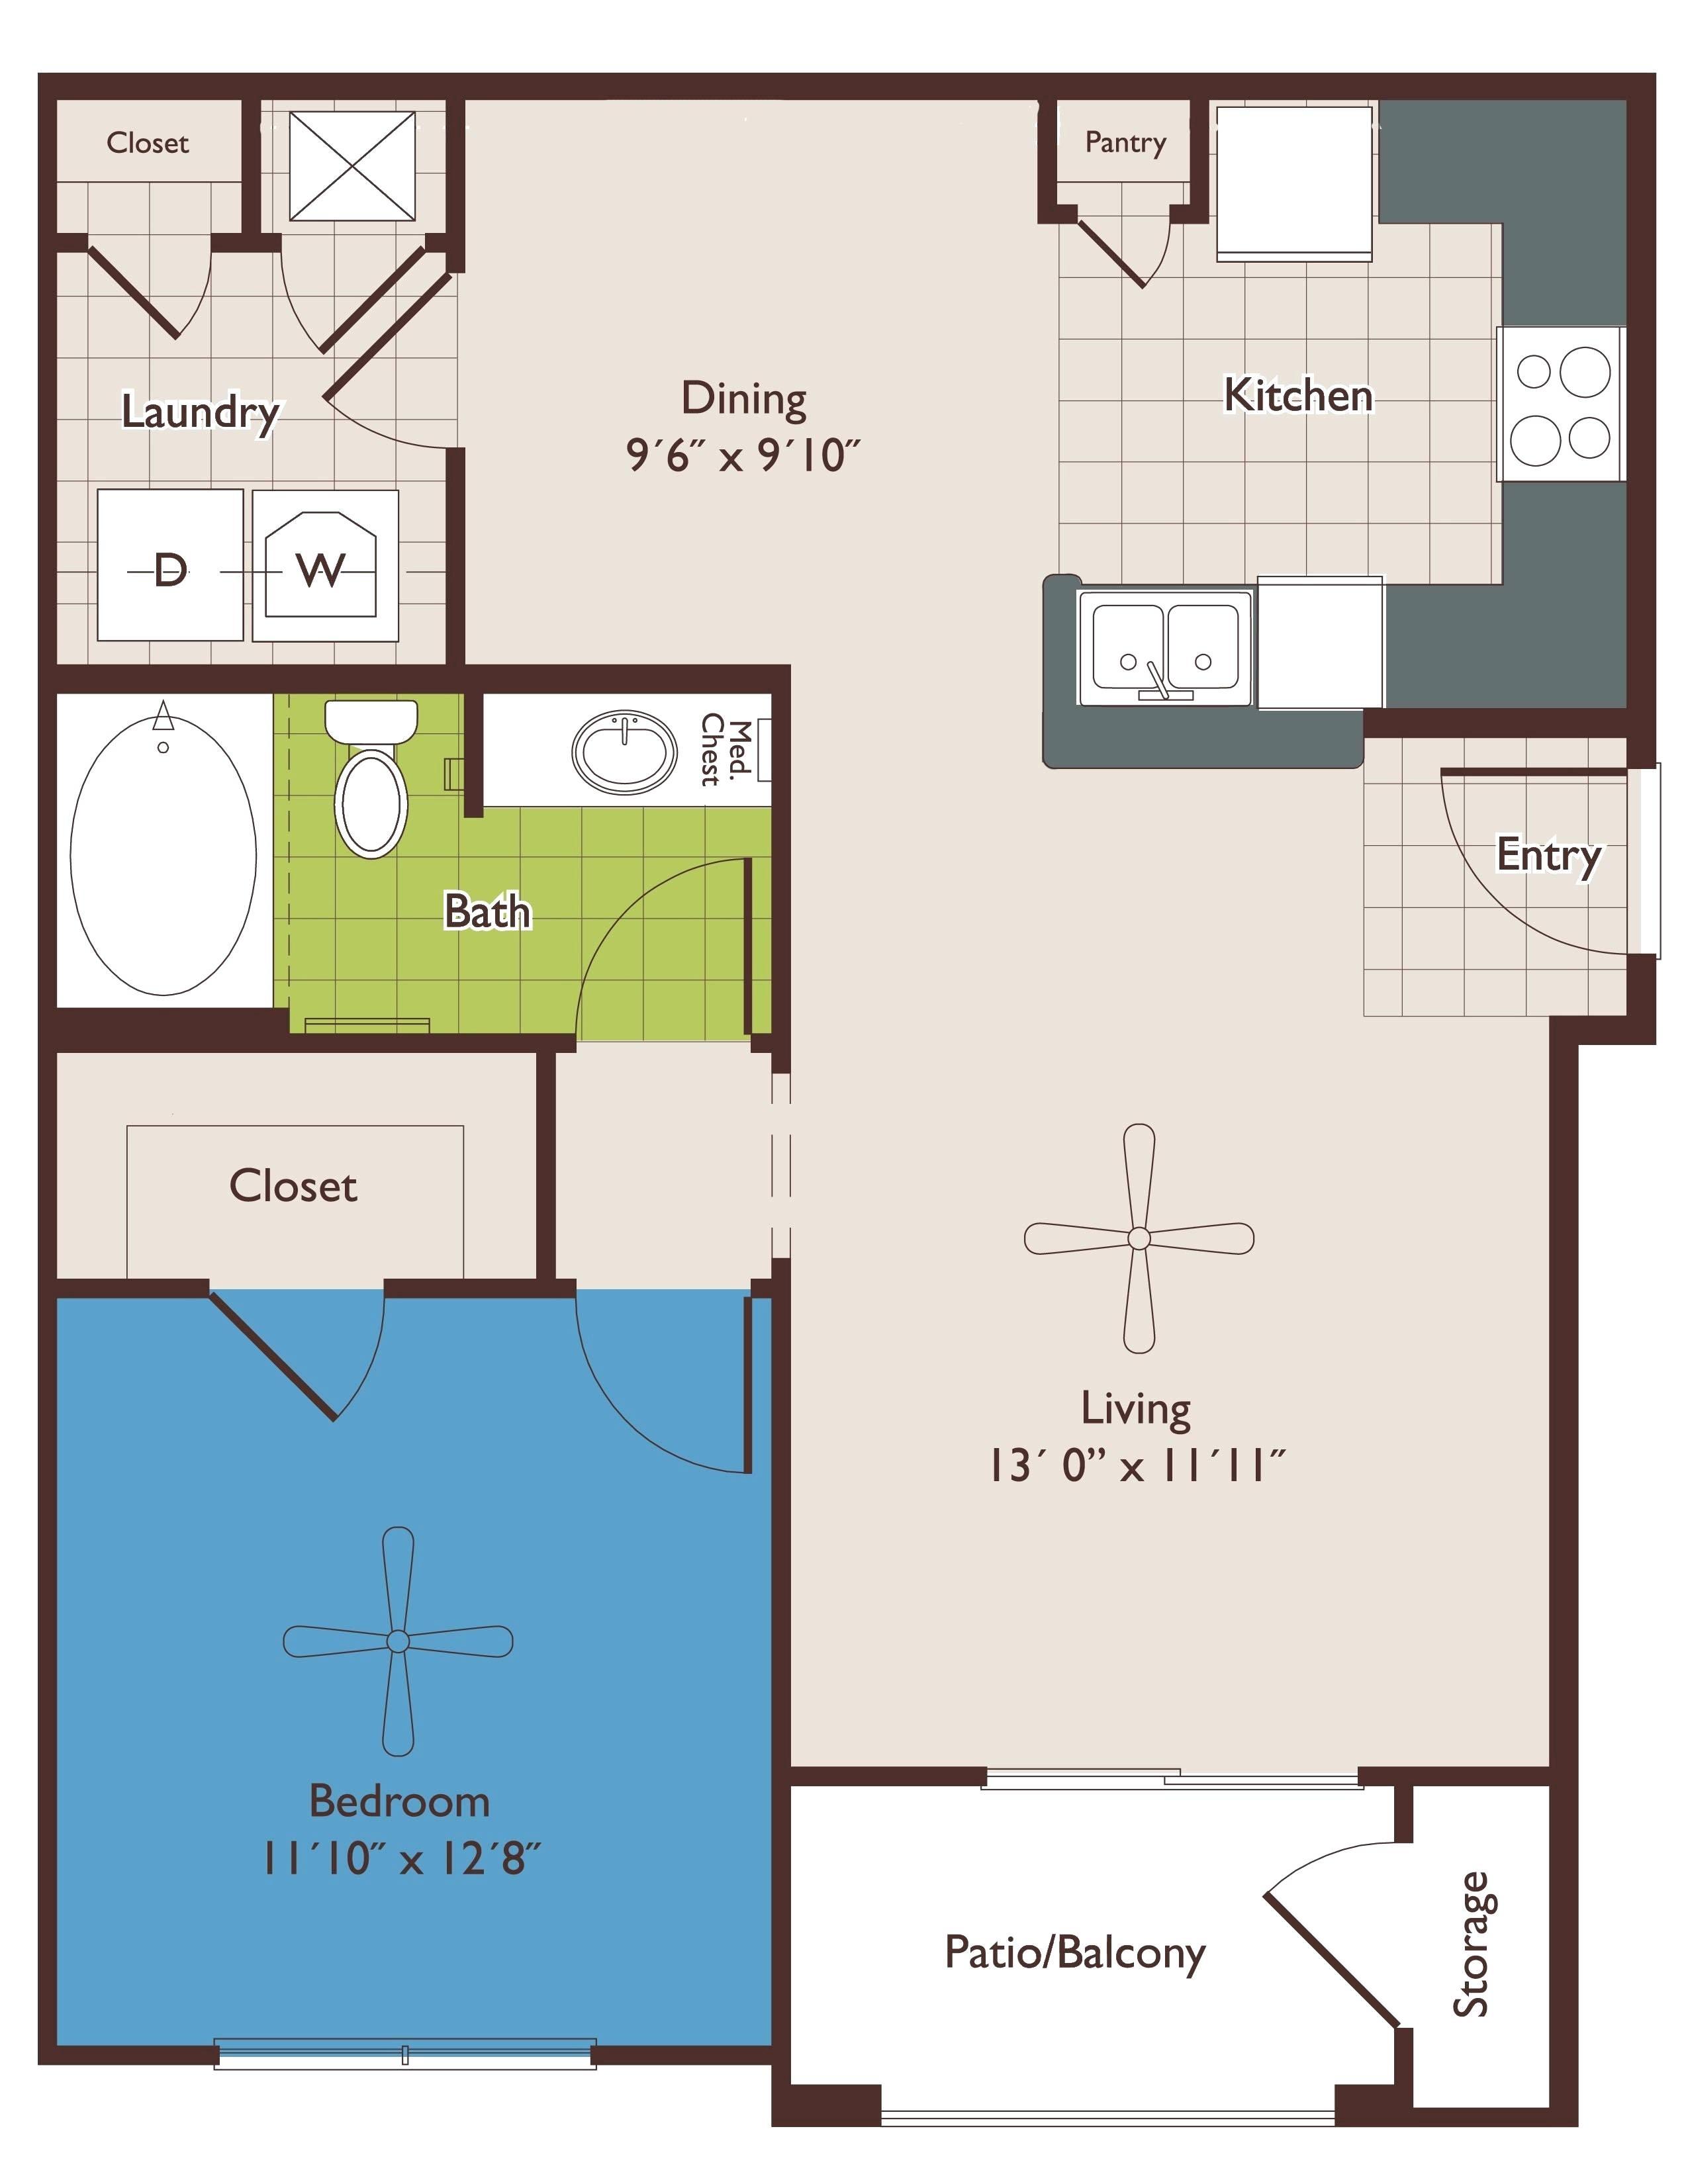 hearthstone homes omaha floor plans awesome woodland homes floor plans luxury 50 luxury hearthstone homes omaha